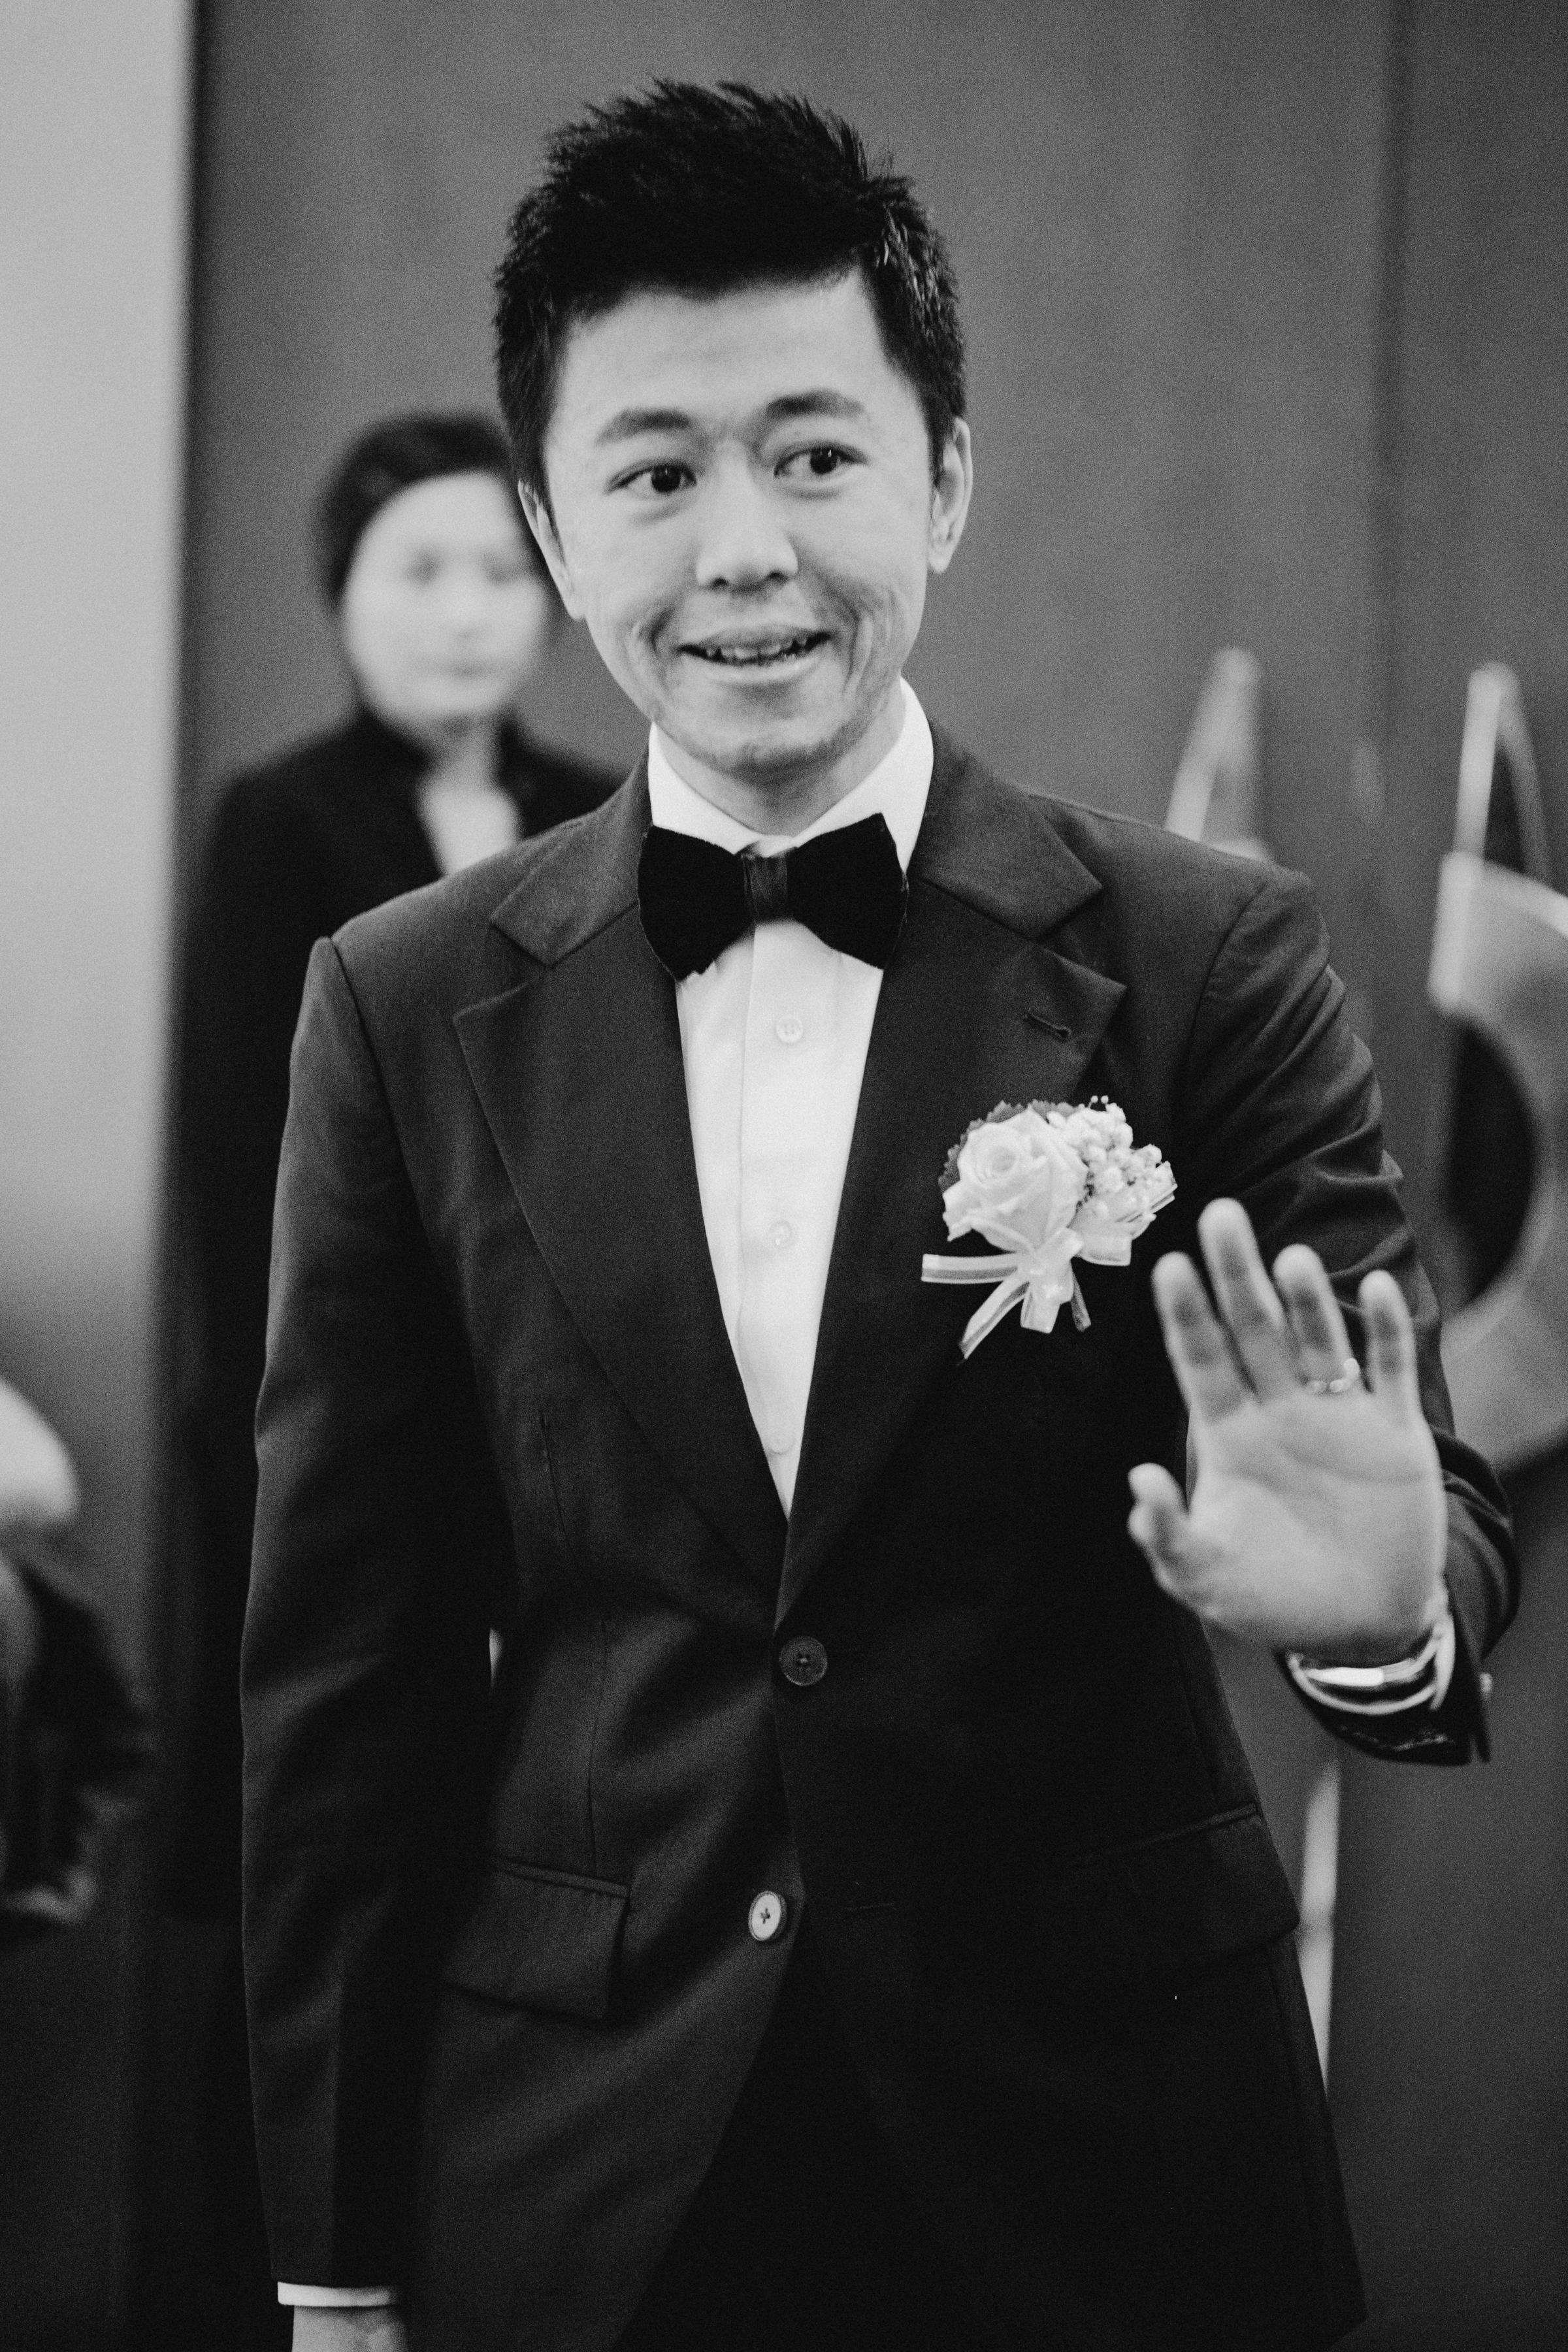 wedding-caridee-oscar-lunch-ambassador-hsinchu-結婚午宴-新竹國賓_58.jpg